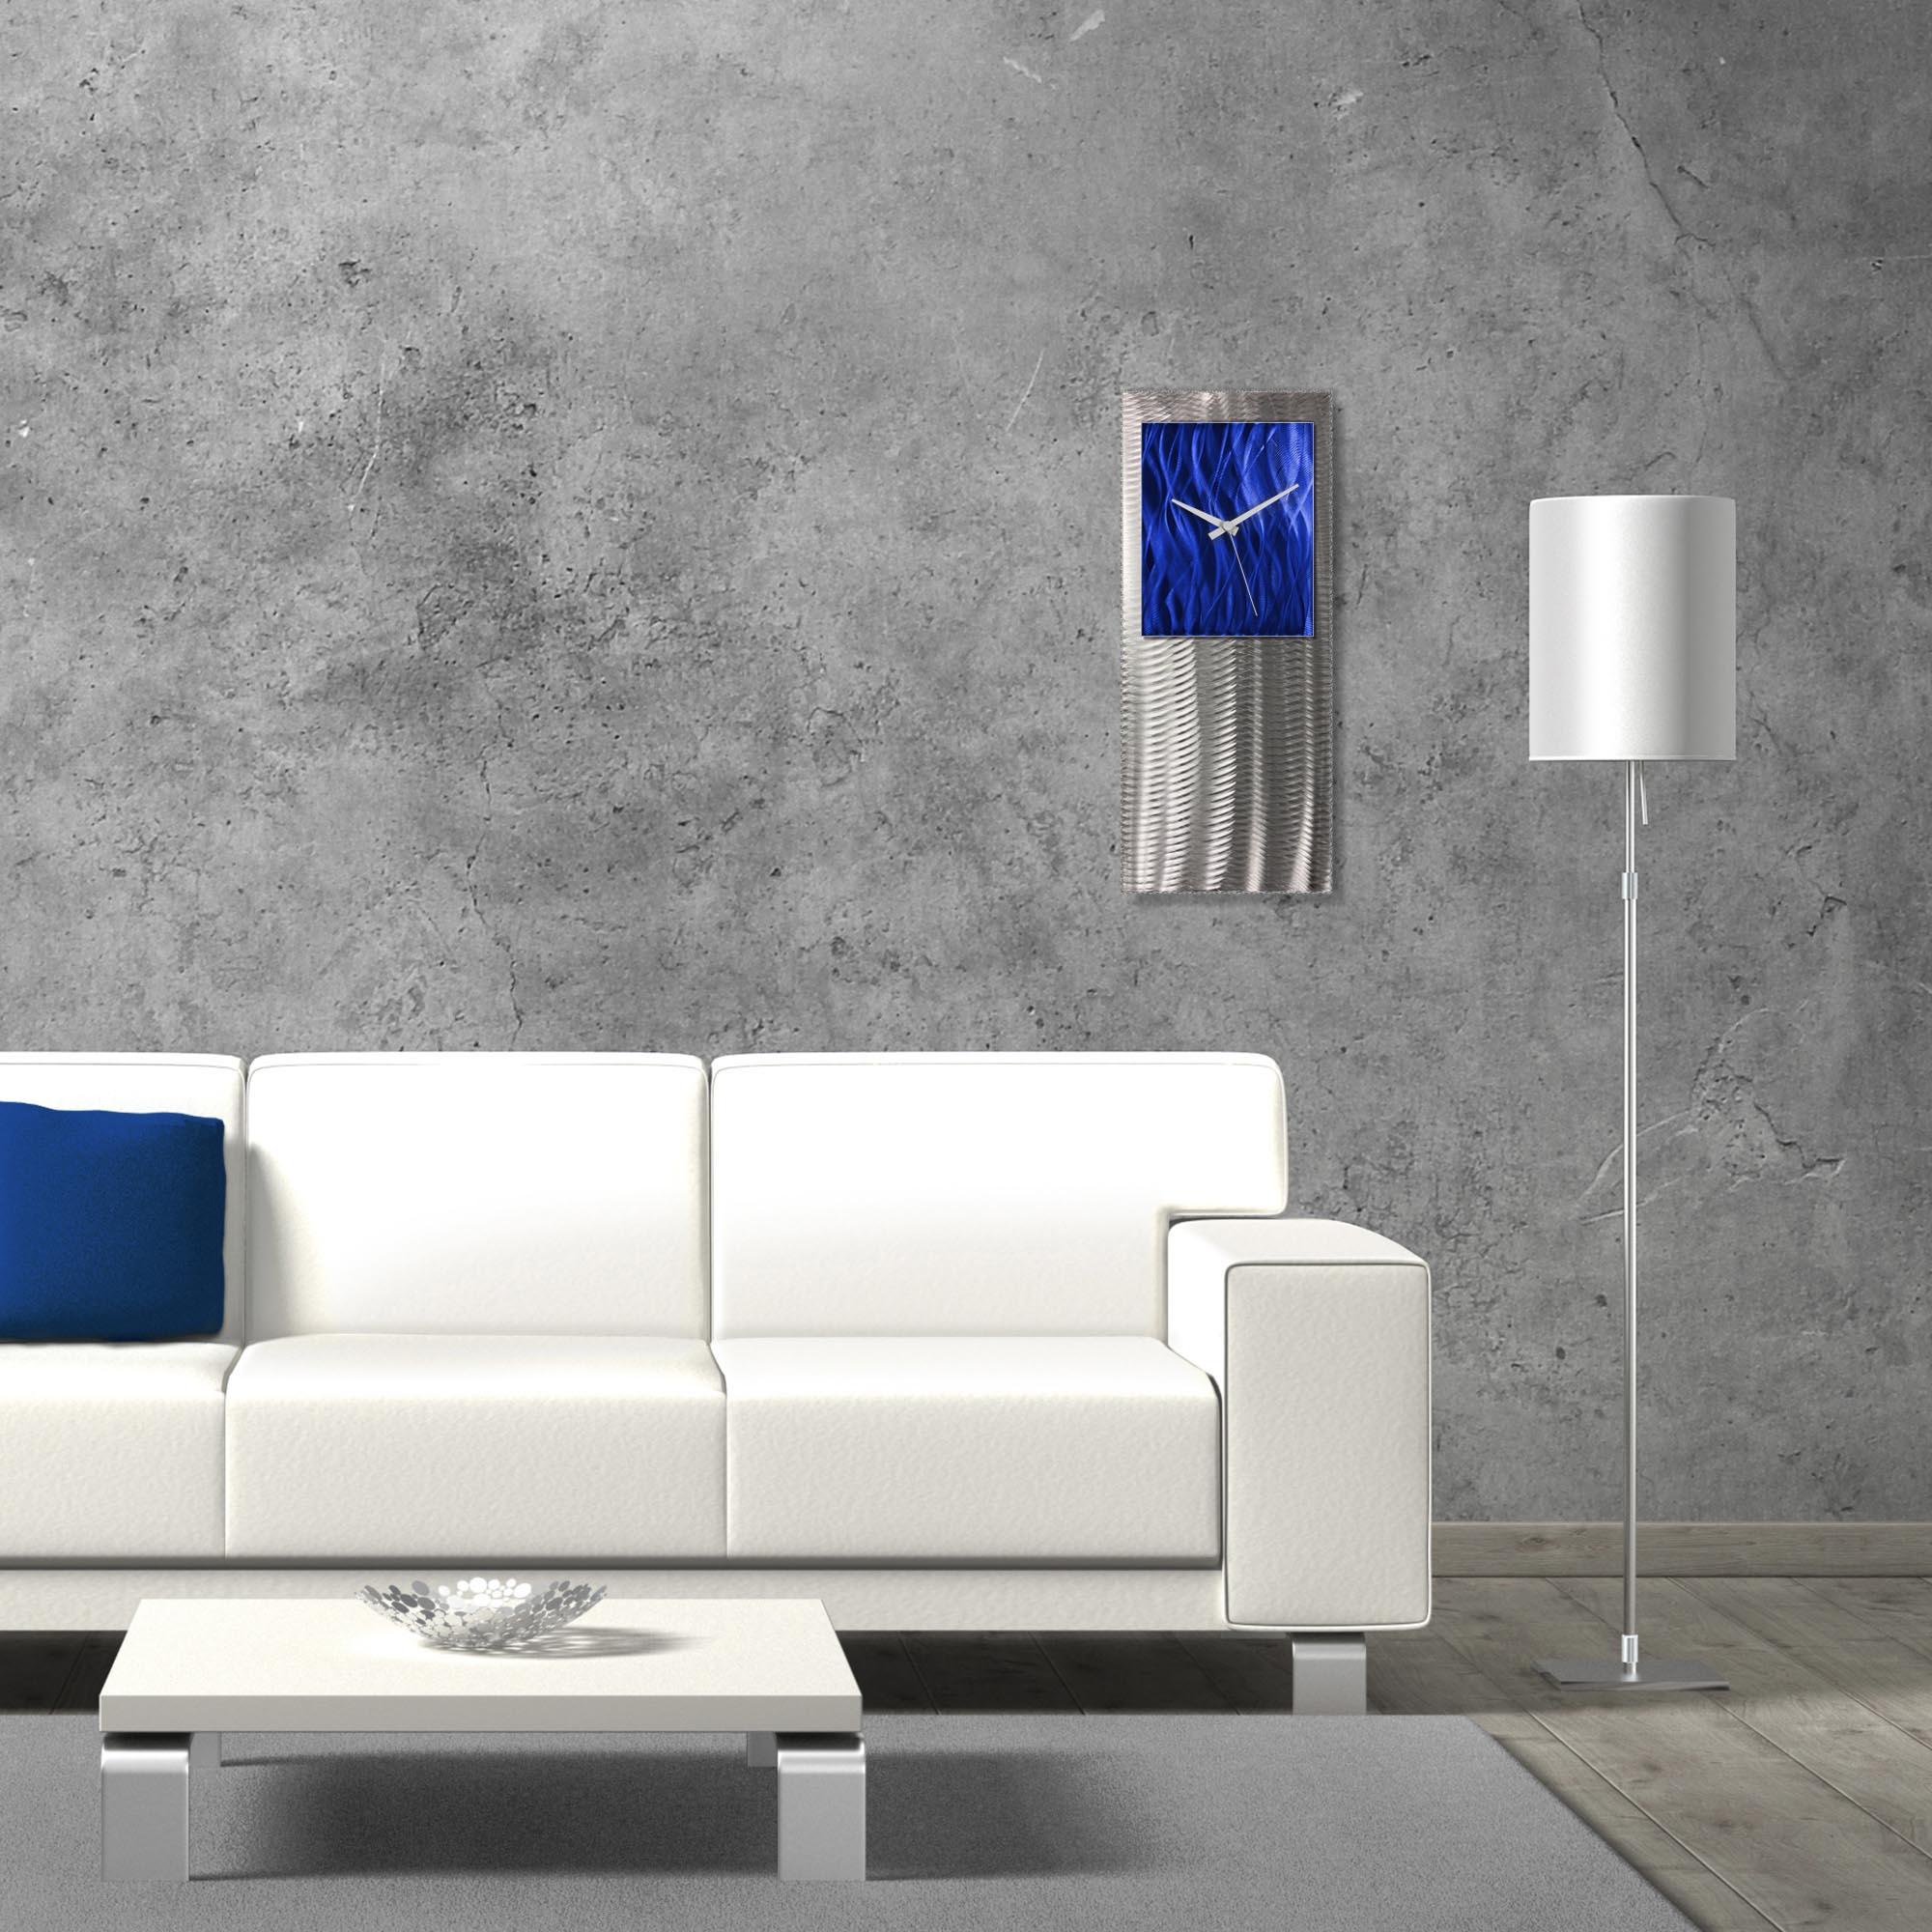 Metal Art Studio Abstract Decor Blue Studio Clock 10in x 24in - Lifestyle View